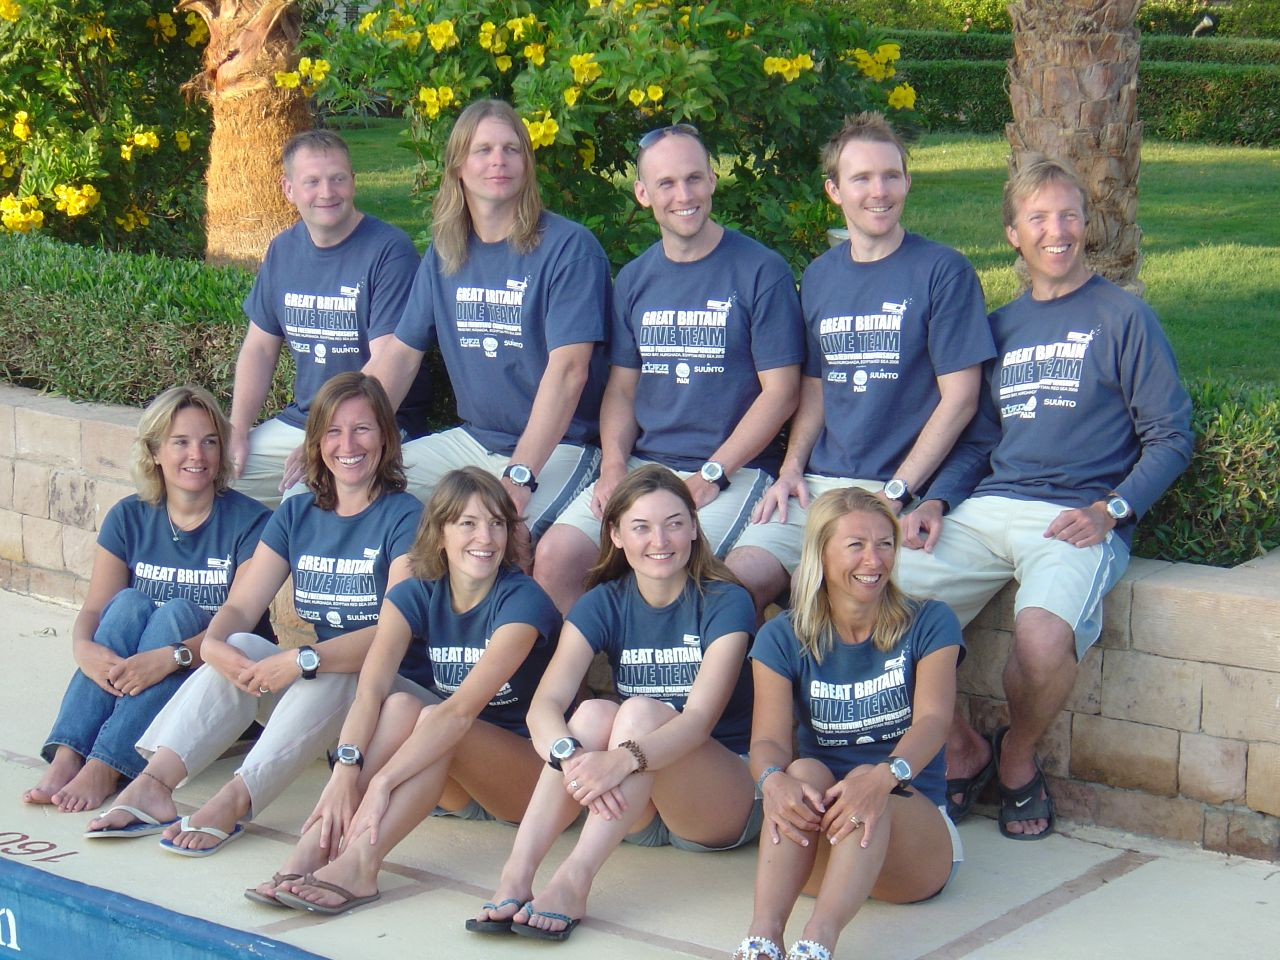 Steve Millard UK Freediving team